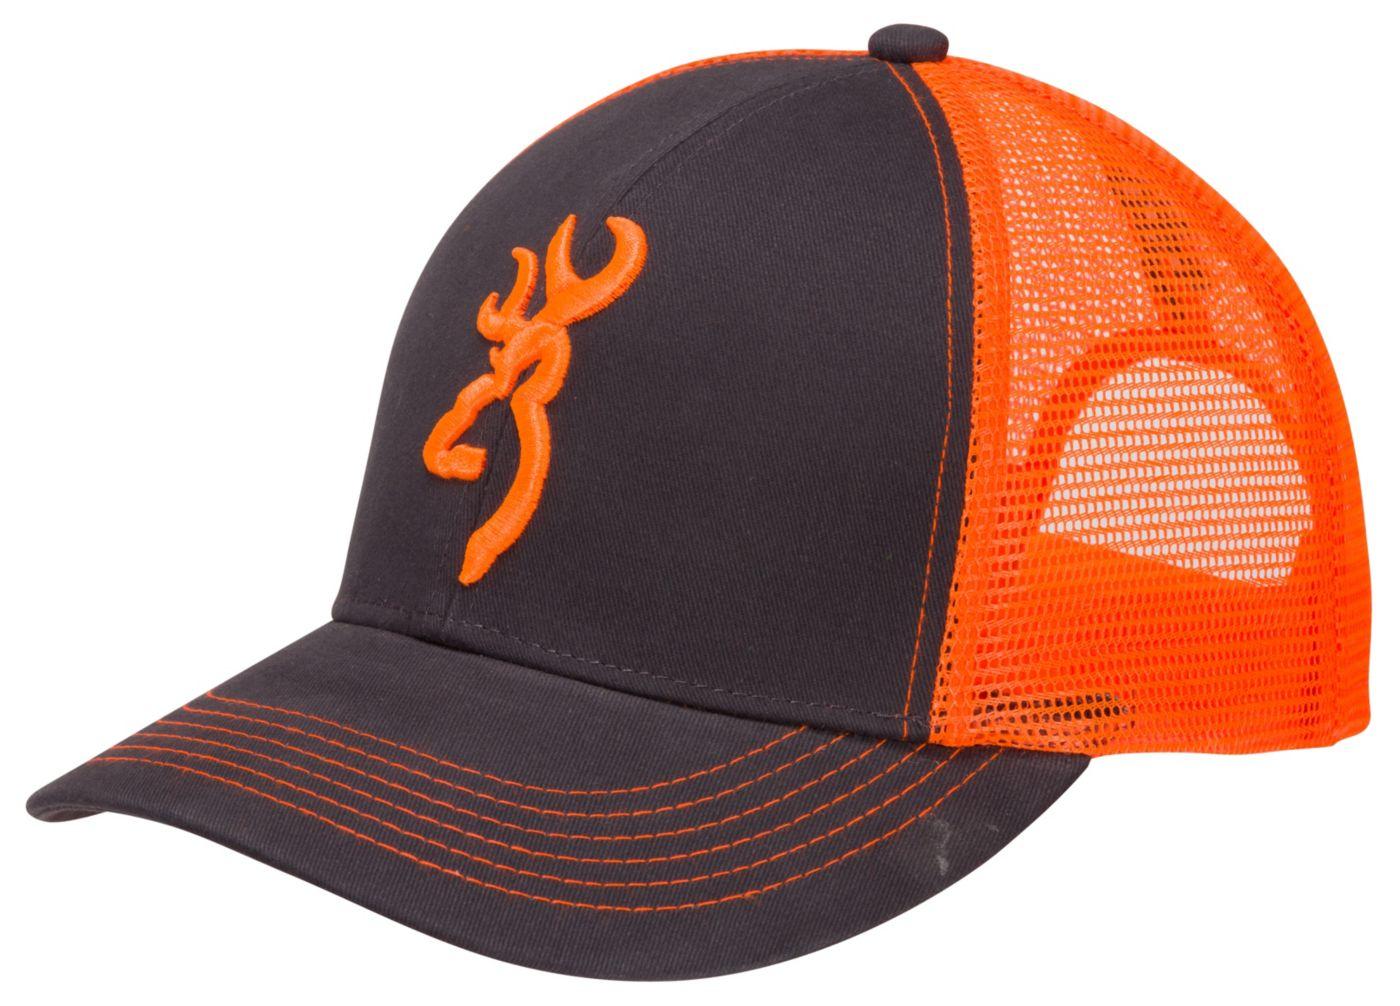 Browning Men's Upland Hat